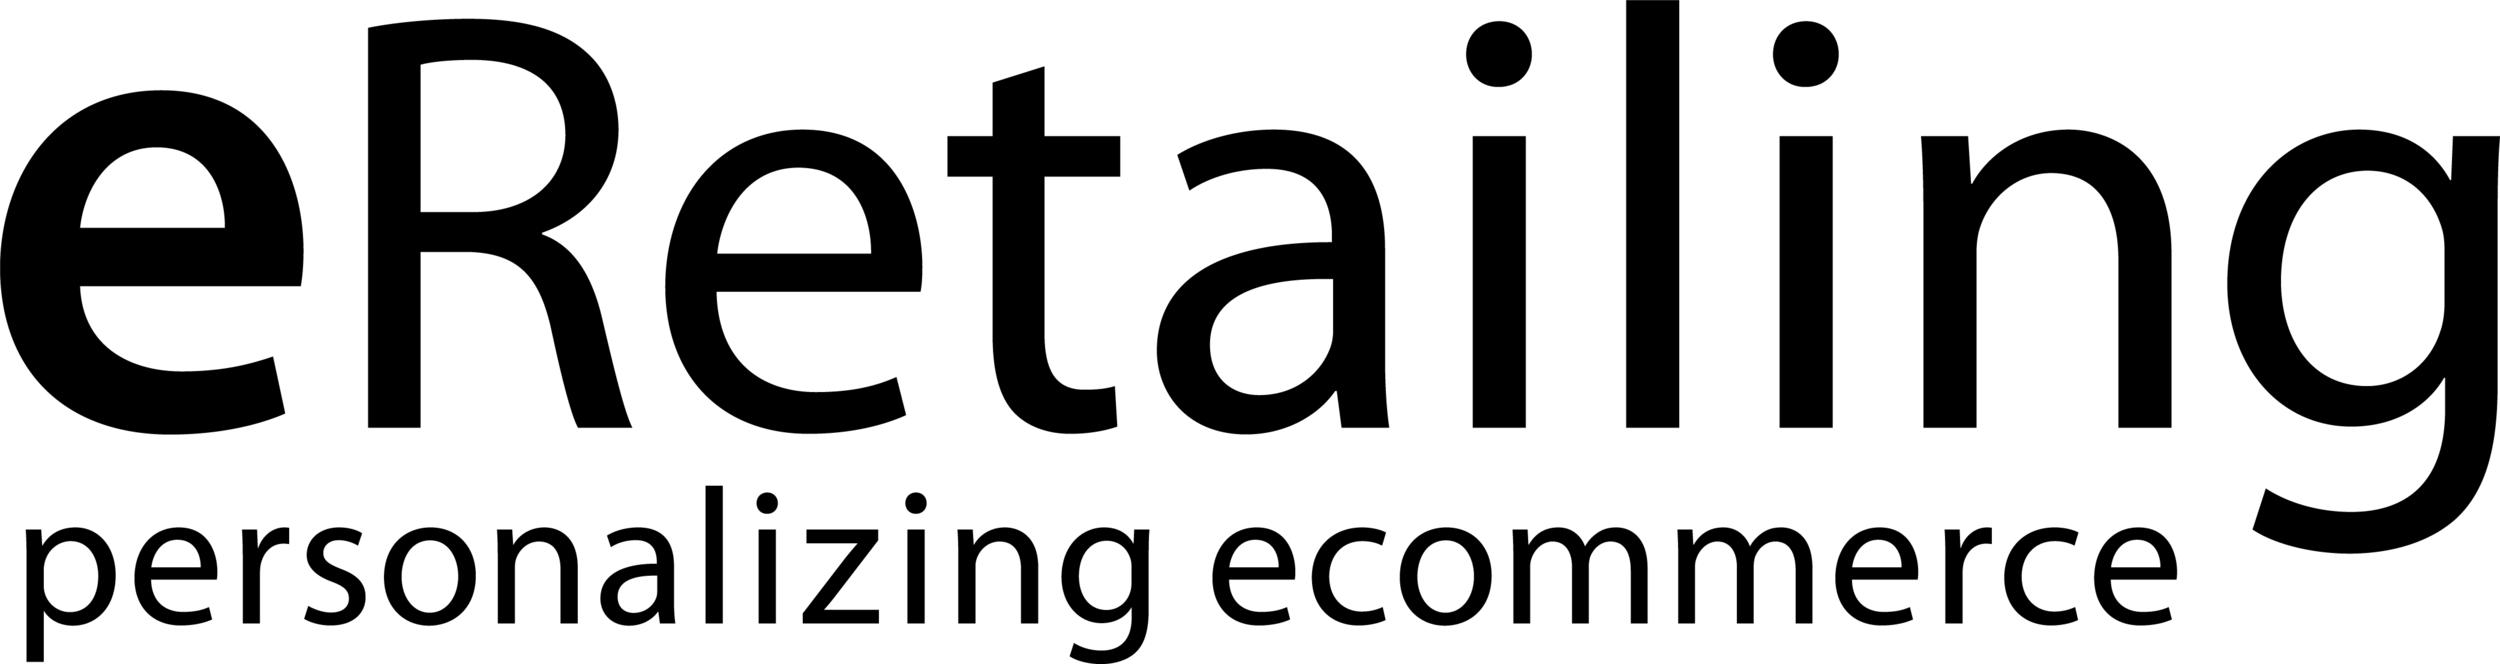 eRetailing-Company-Logo.png